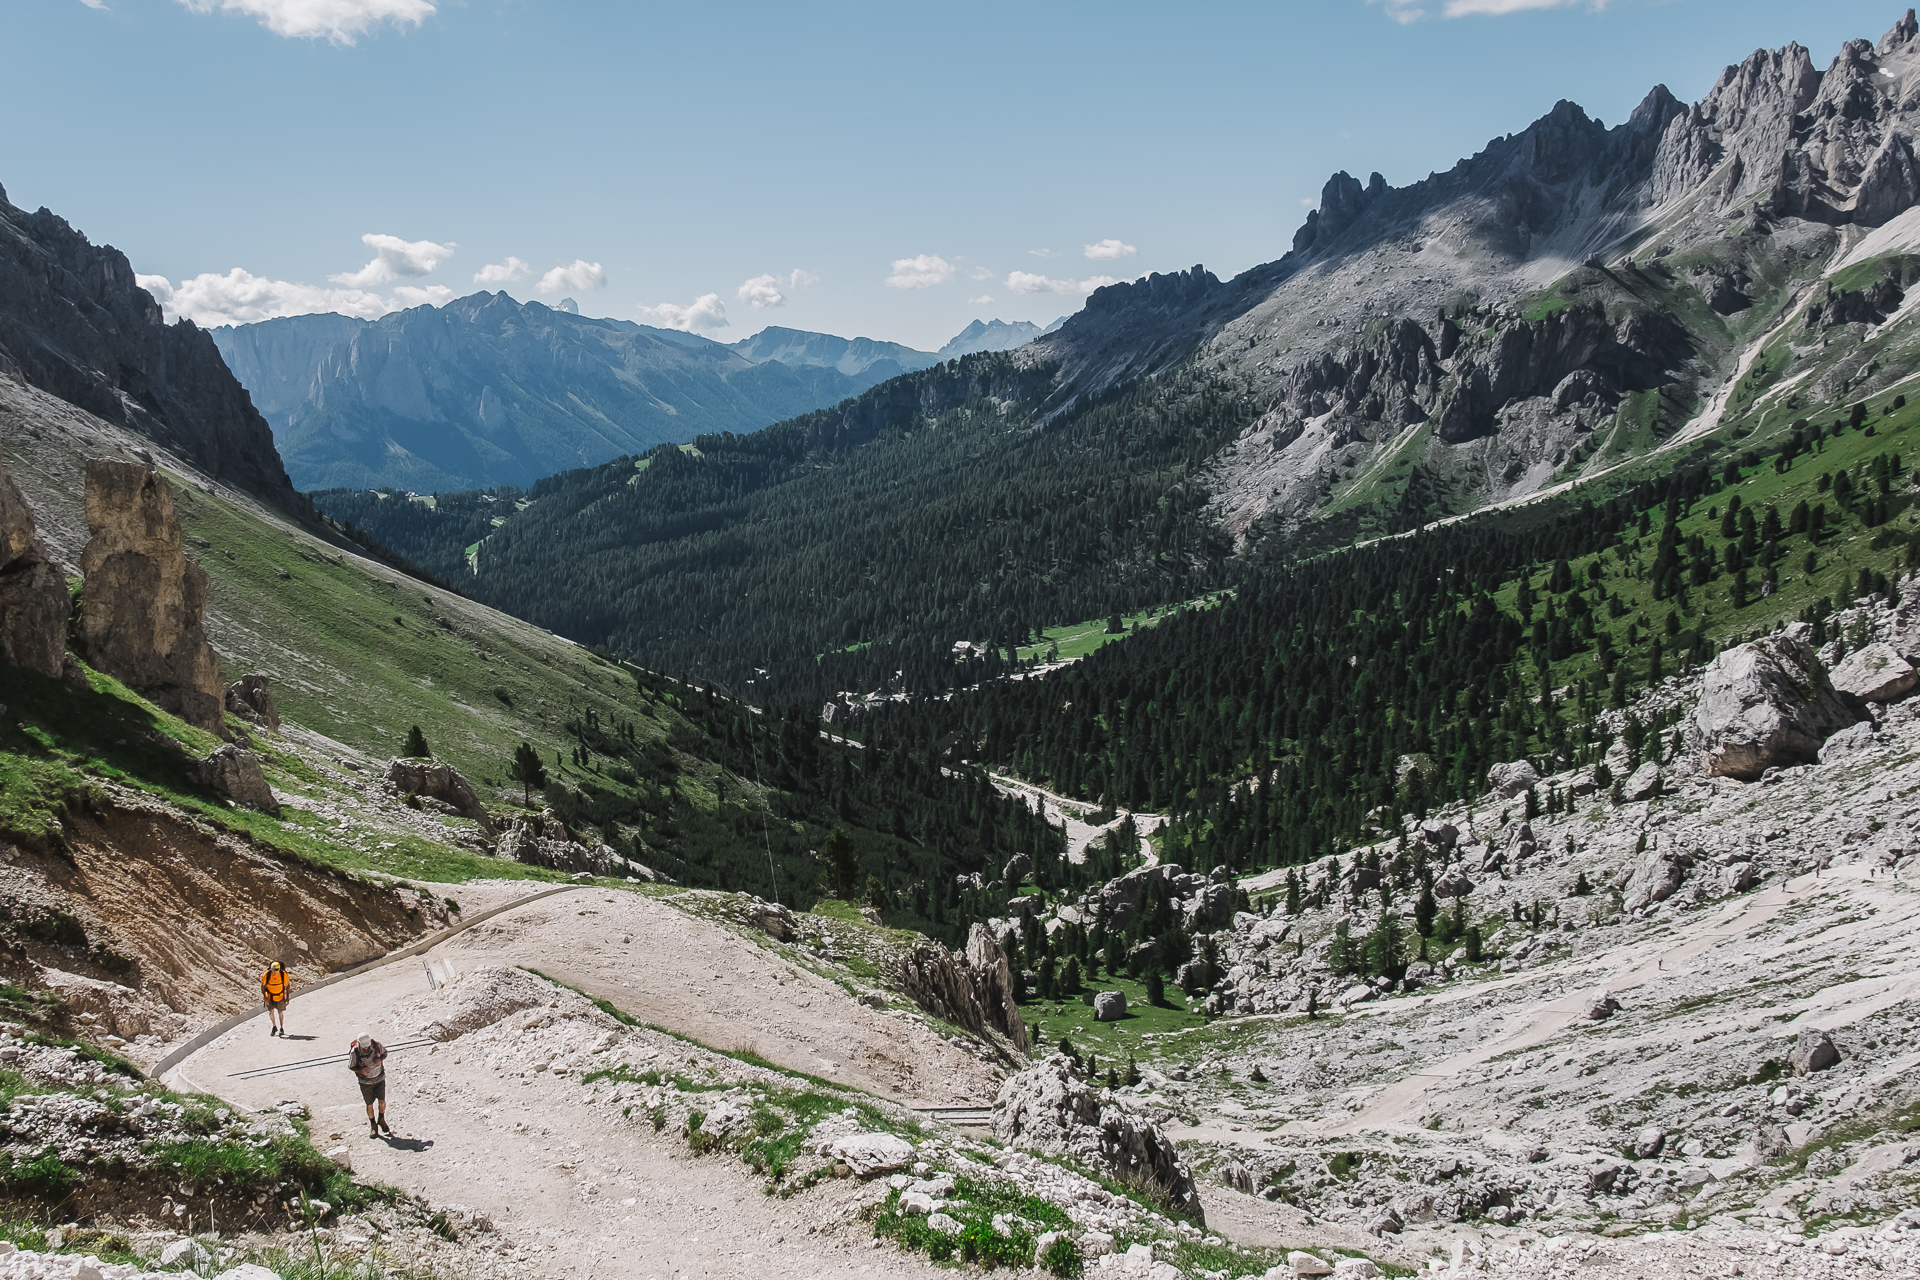 Ré Alberto, Vajolet, Catinaccio, Rosengarten, Val di Fassa, Canazei, Italy, Travel